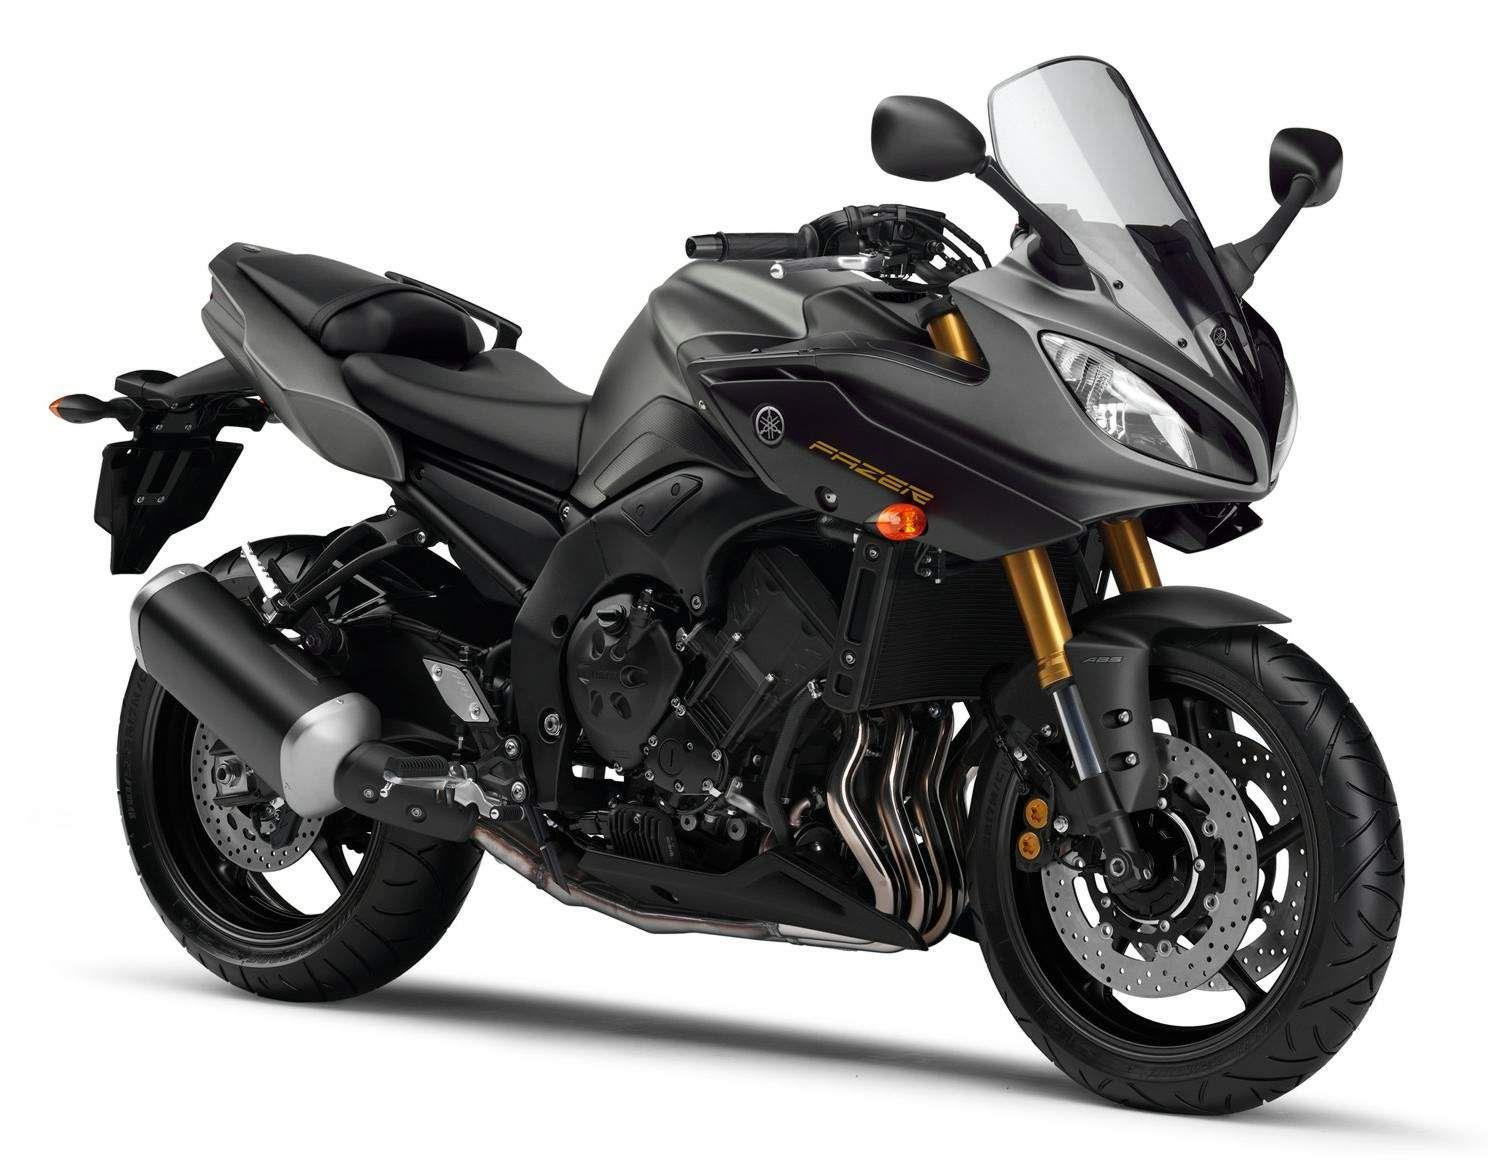 Fz 8 Fazer 2012 Honda Bikes India Motorcycle Yamaha